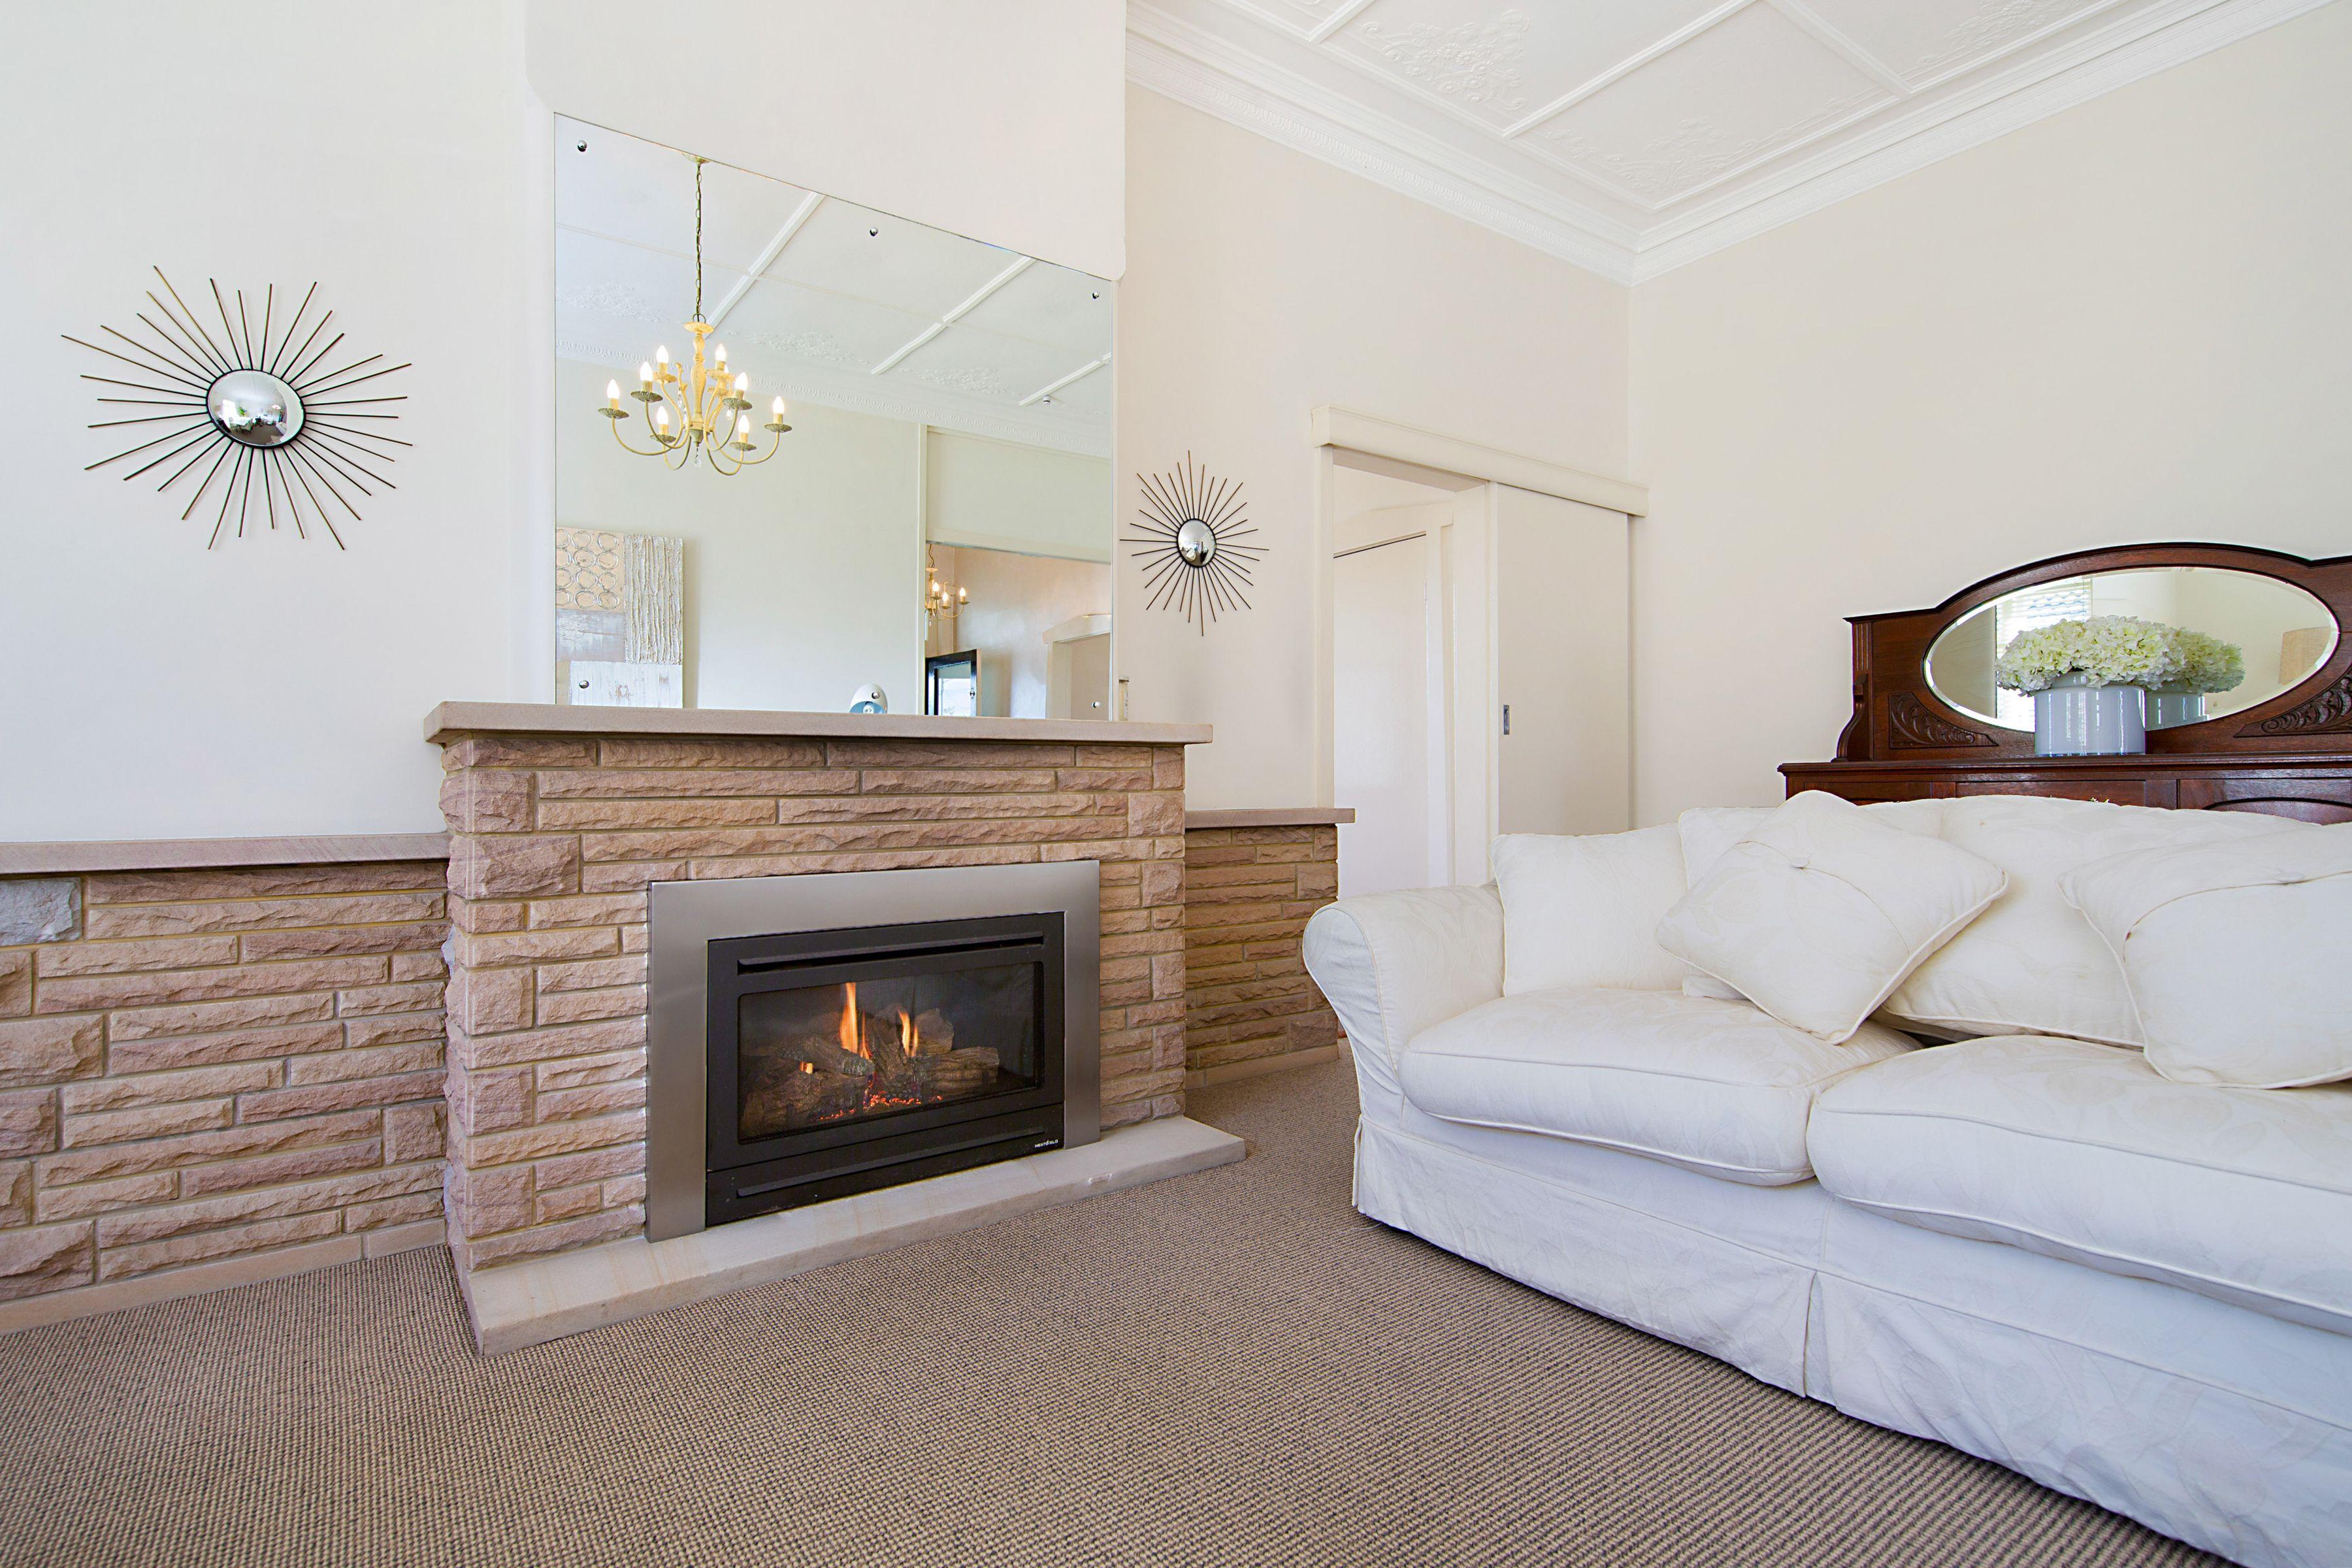 real estate 127 stewart avenue hamilton south nsw 2303 house